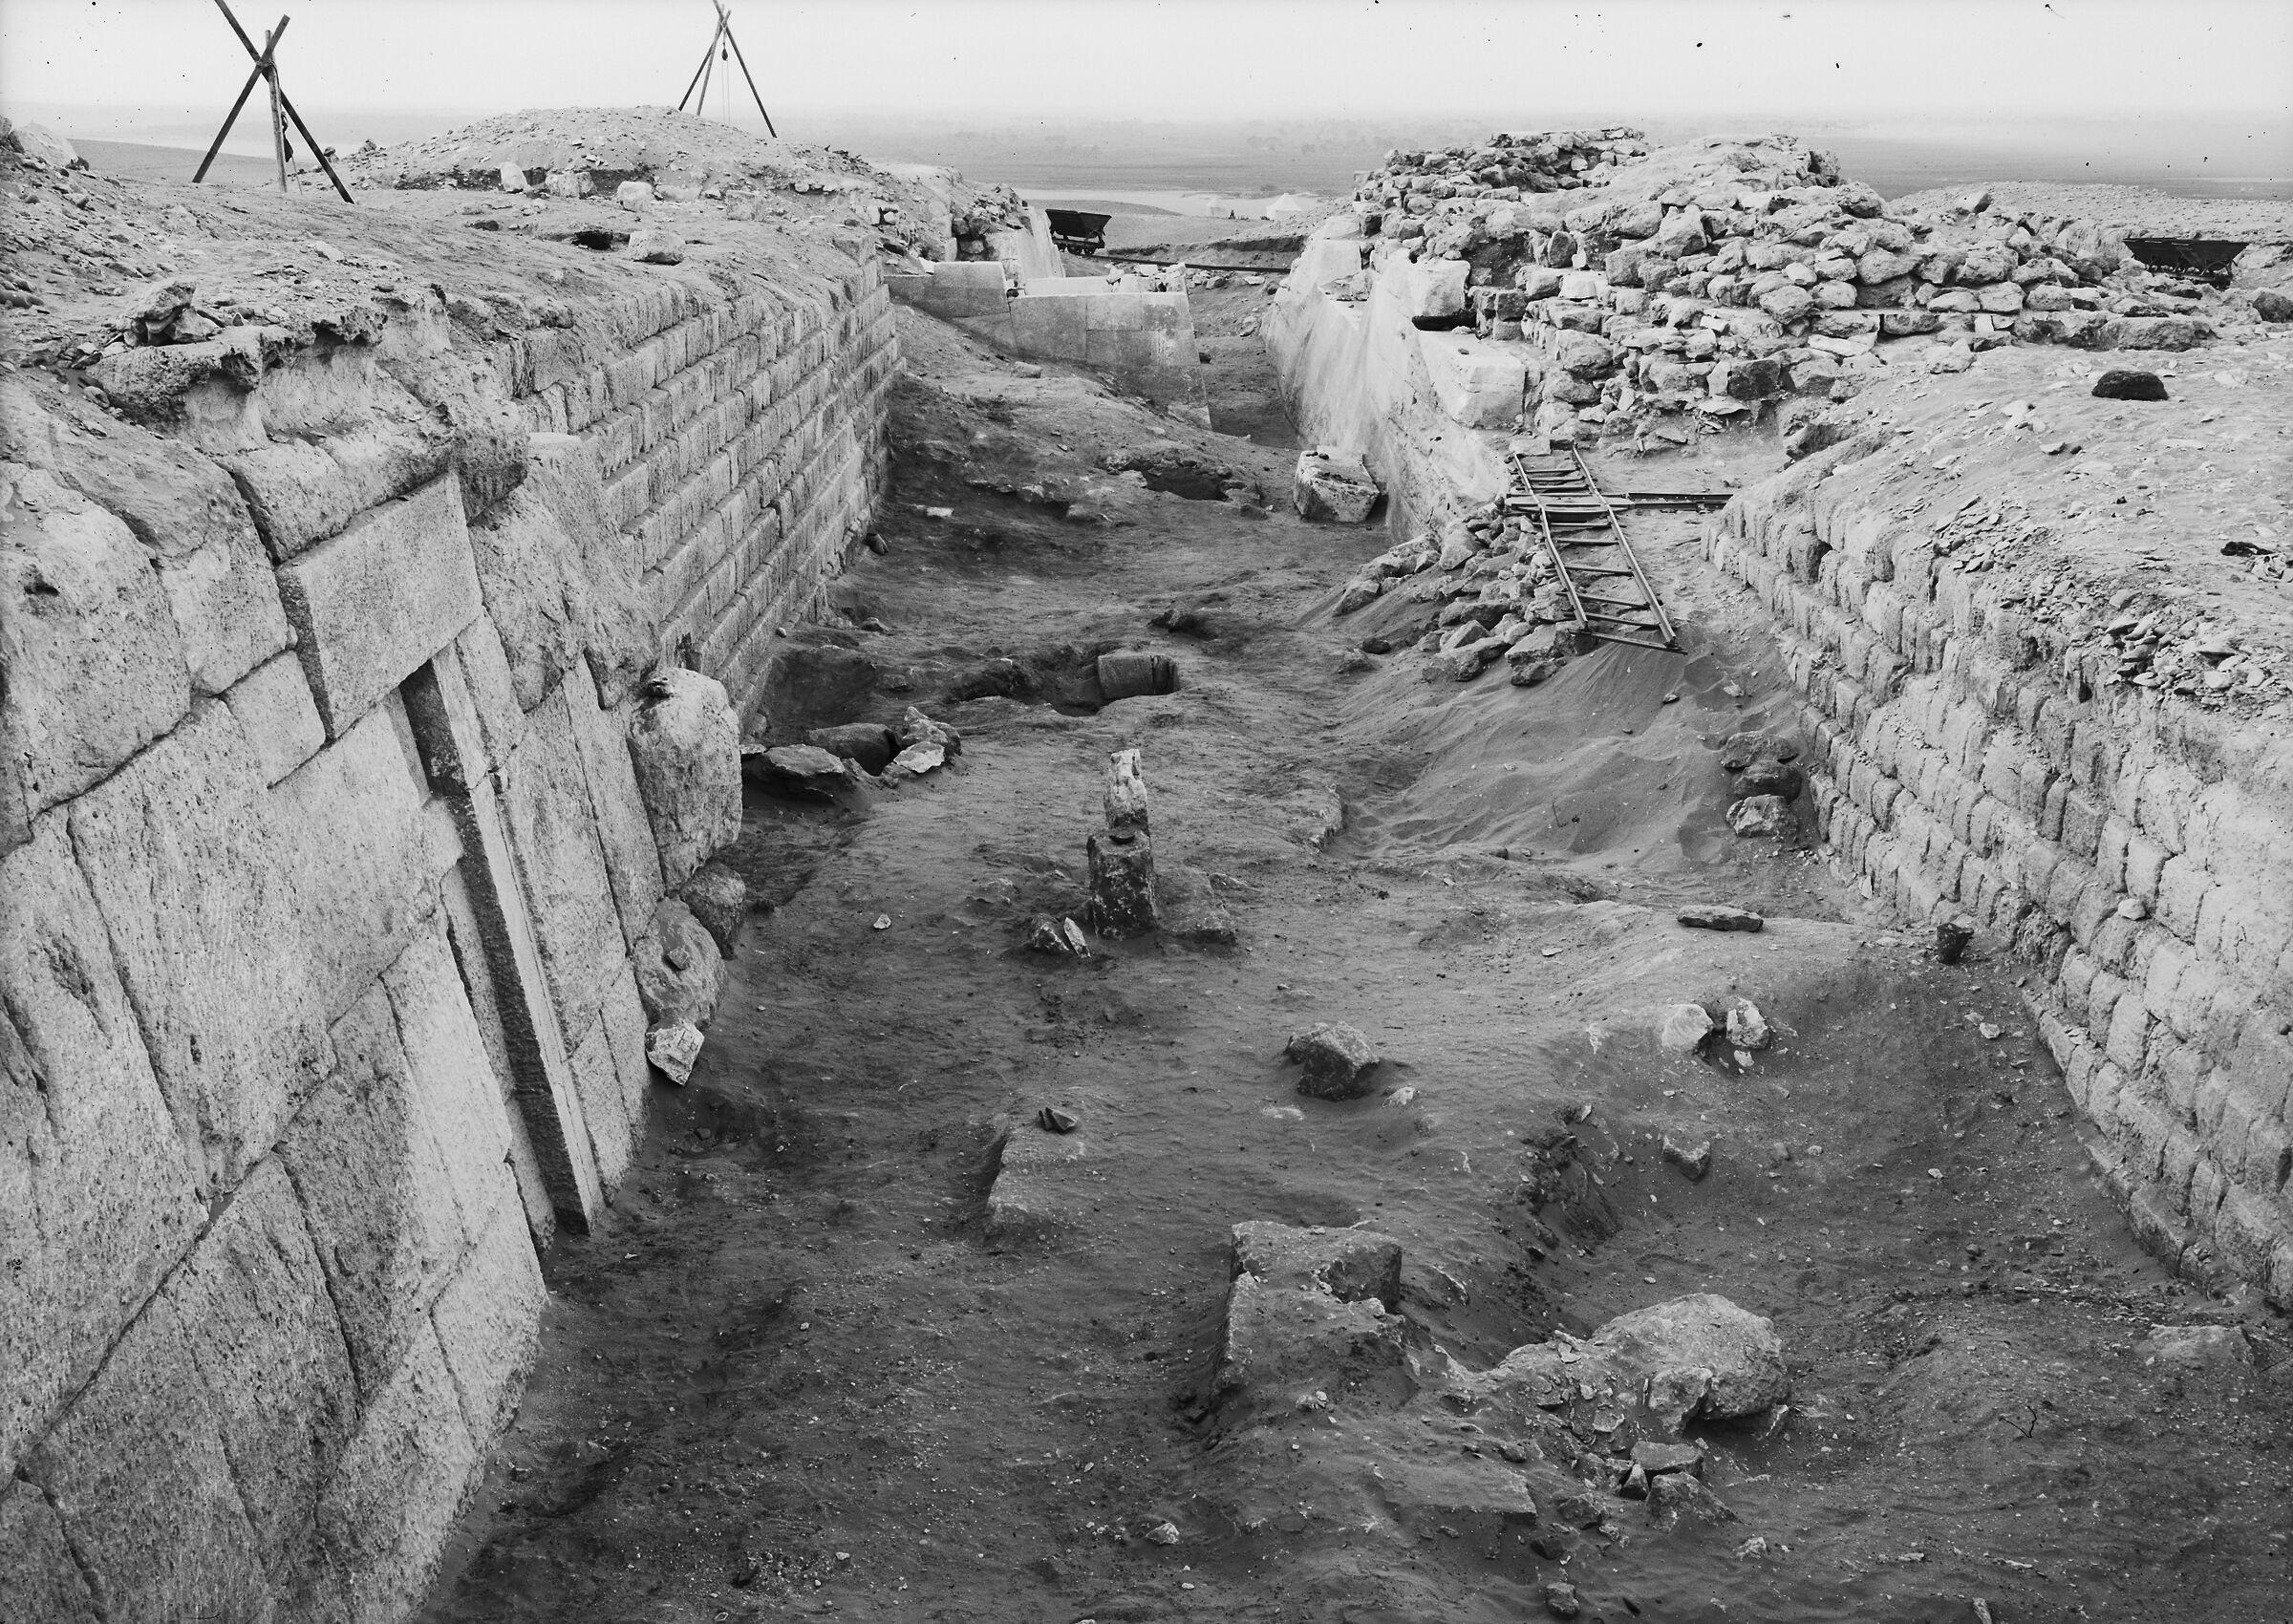 Western Cemetery: Site: Giza; View: G 2100, G 2100-I, G 2120, G 2130, G 2110